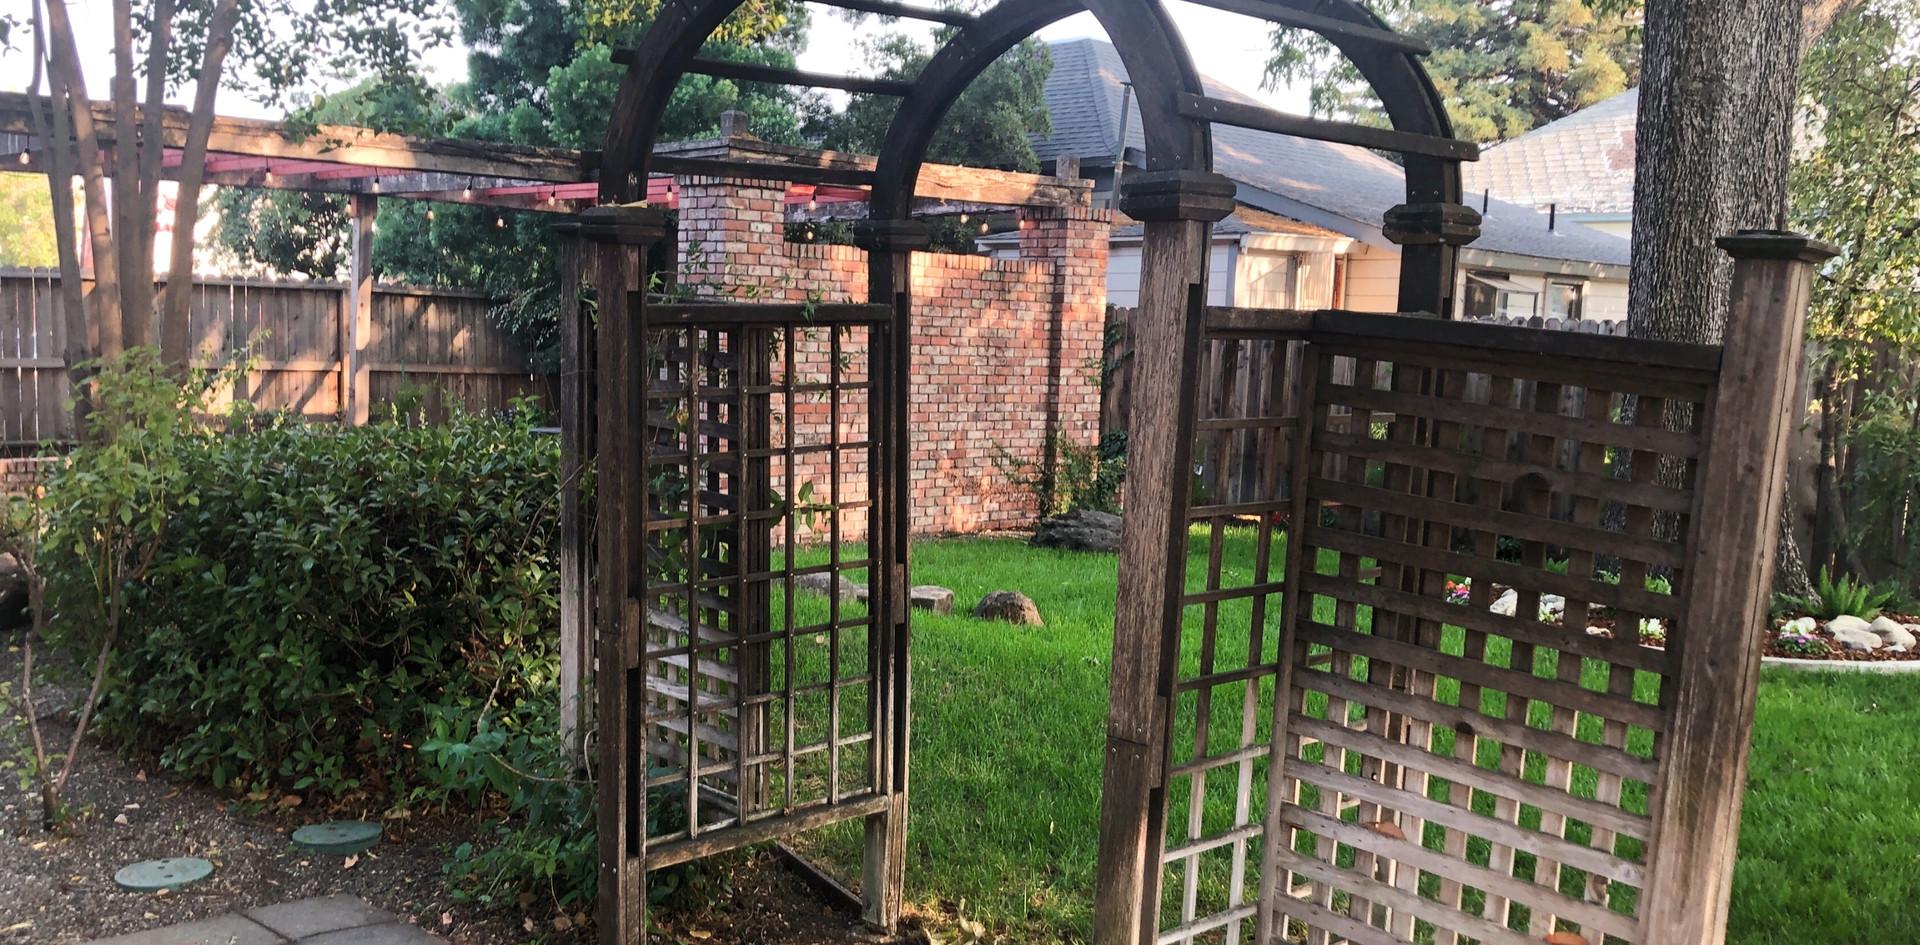 Green Grass, Aged Brick, Rustic Arbor